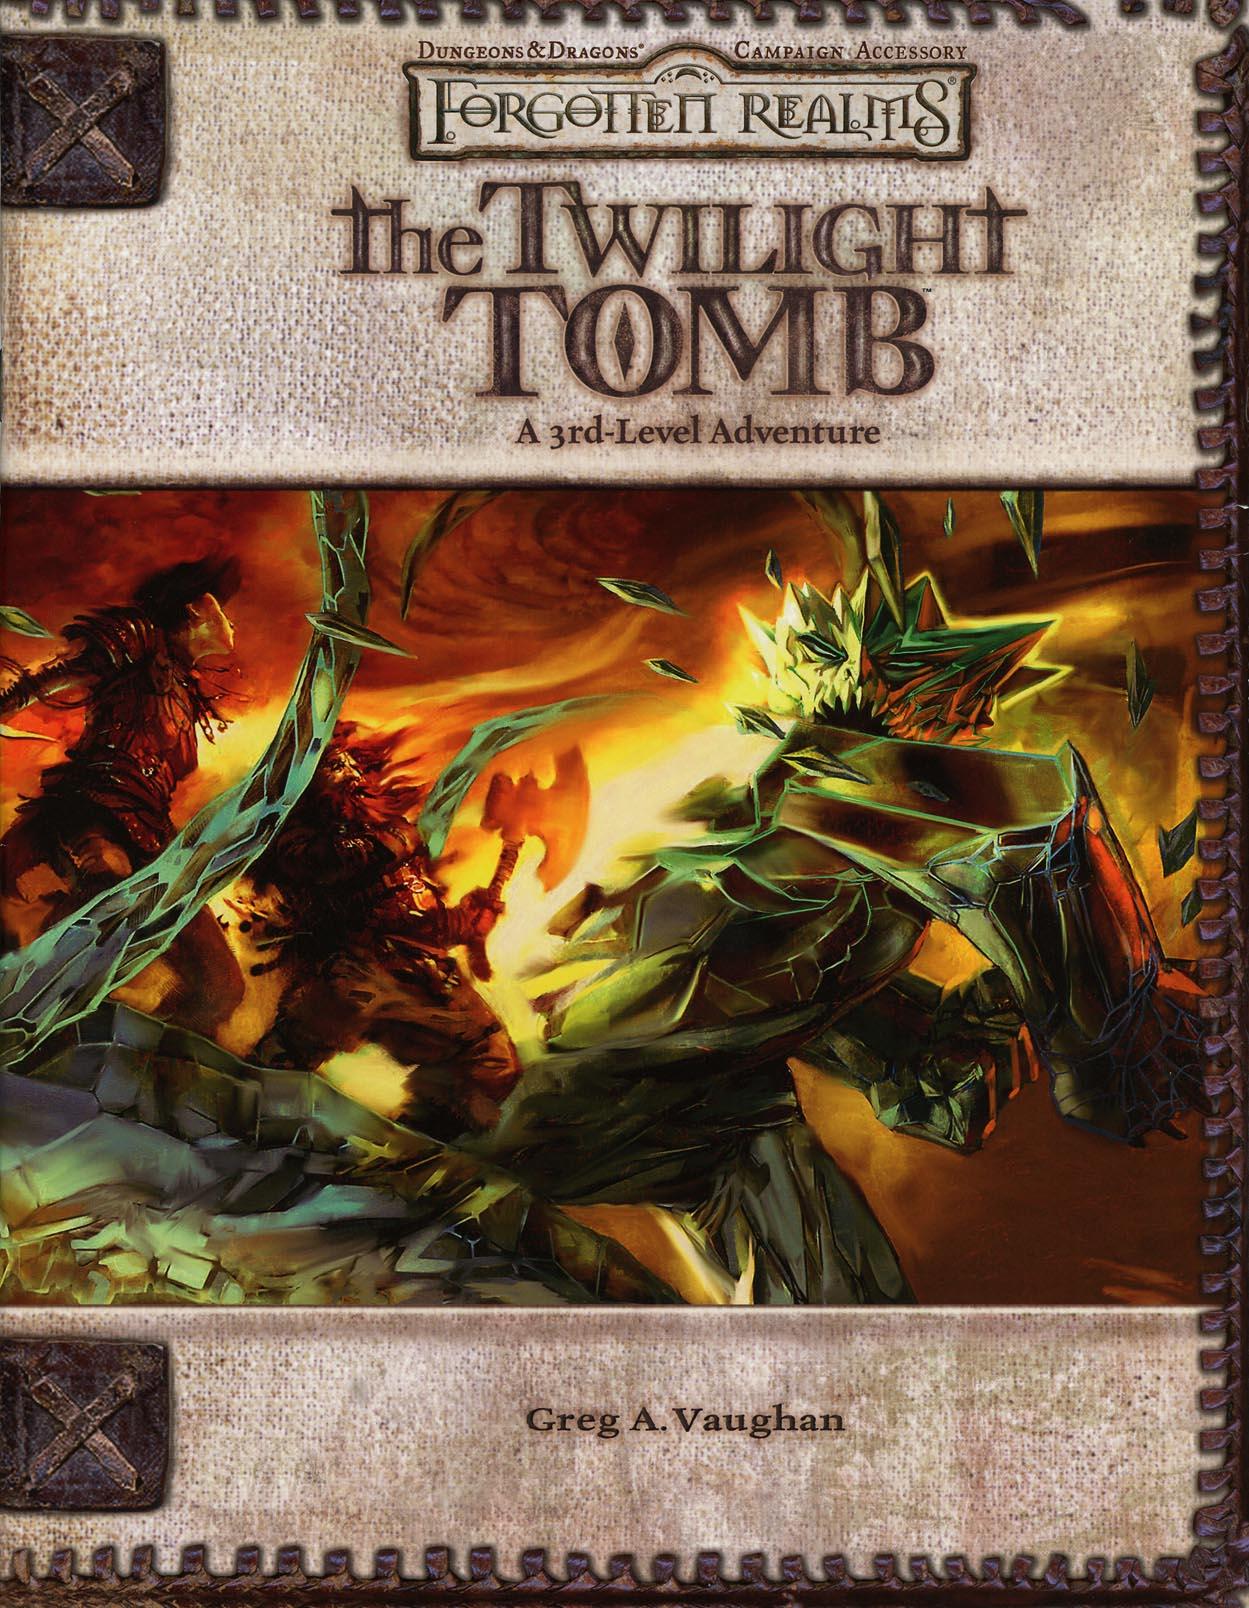 File:The Twilight Tomb.jpg